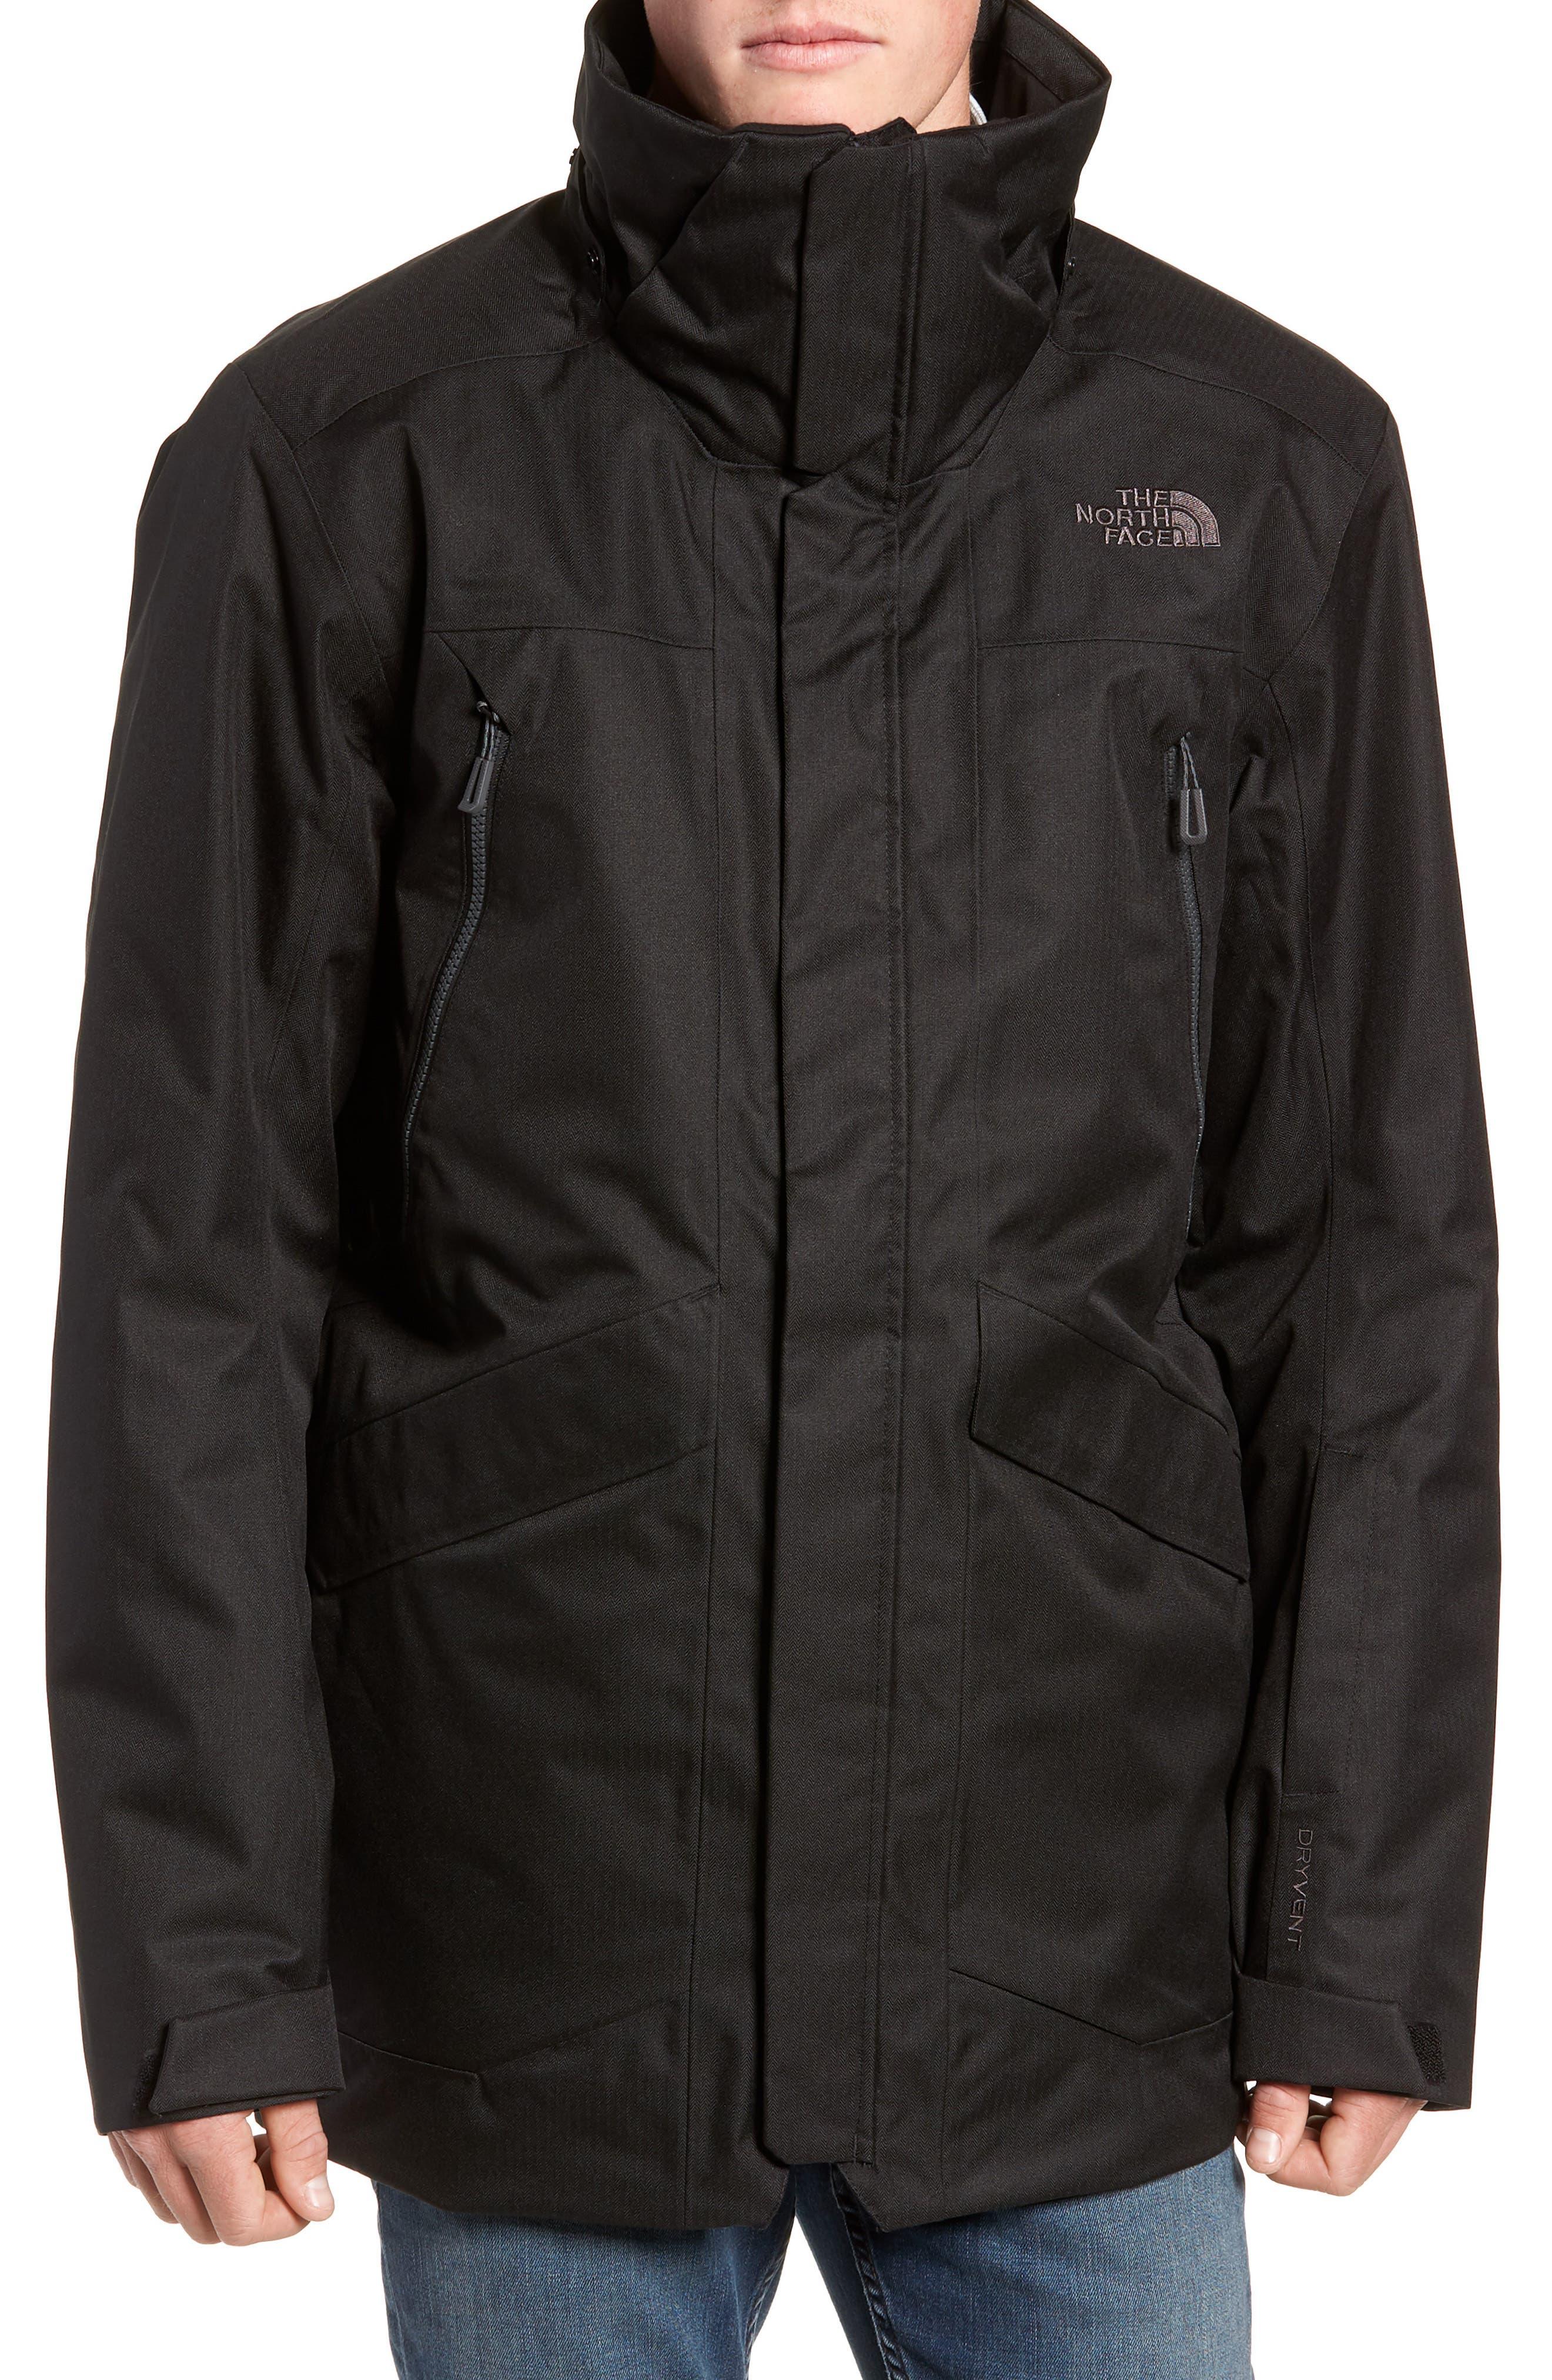 THE NORTH FACE, Gatekeeper Waterproof Jacket, Alternate thumbnail 5, color, 005